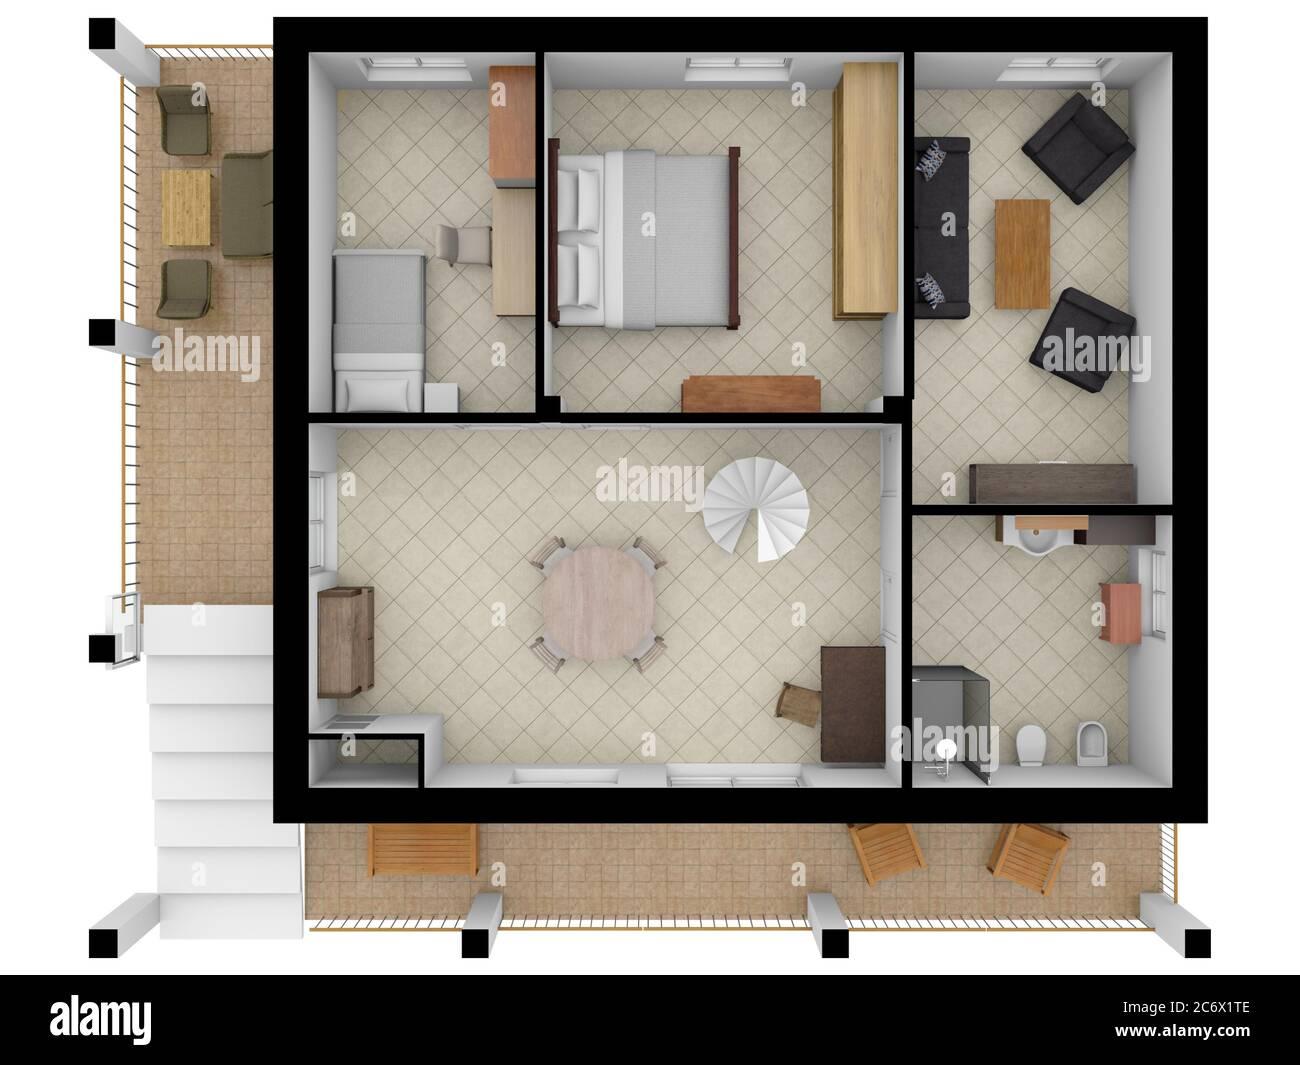 Floor Plan Interior 3d Floor Plan For Real Estate Home Plan 3d Design Of Home Space Color Floor Plan Stock Photo Alamy